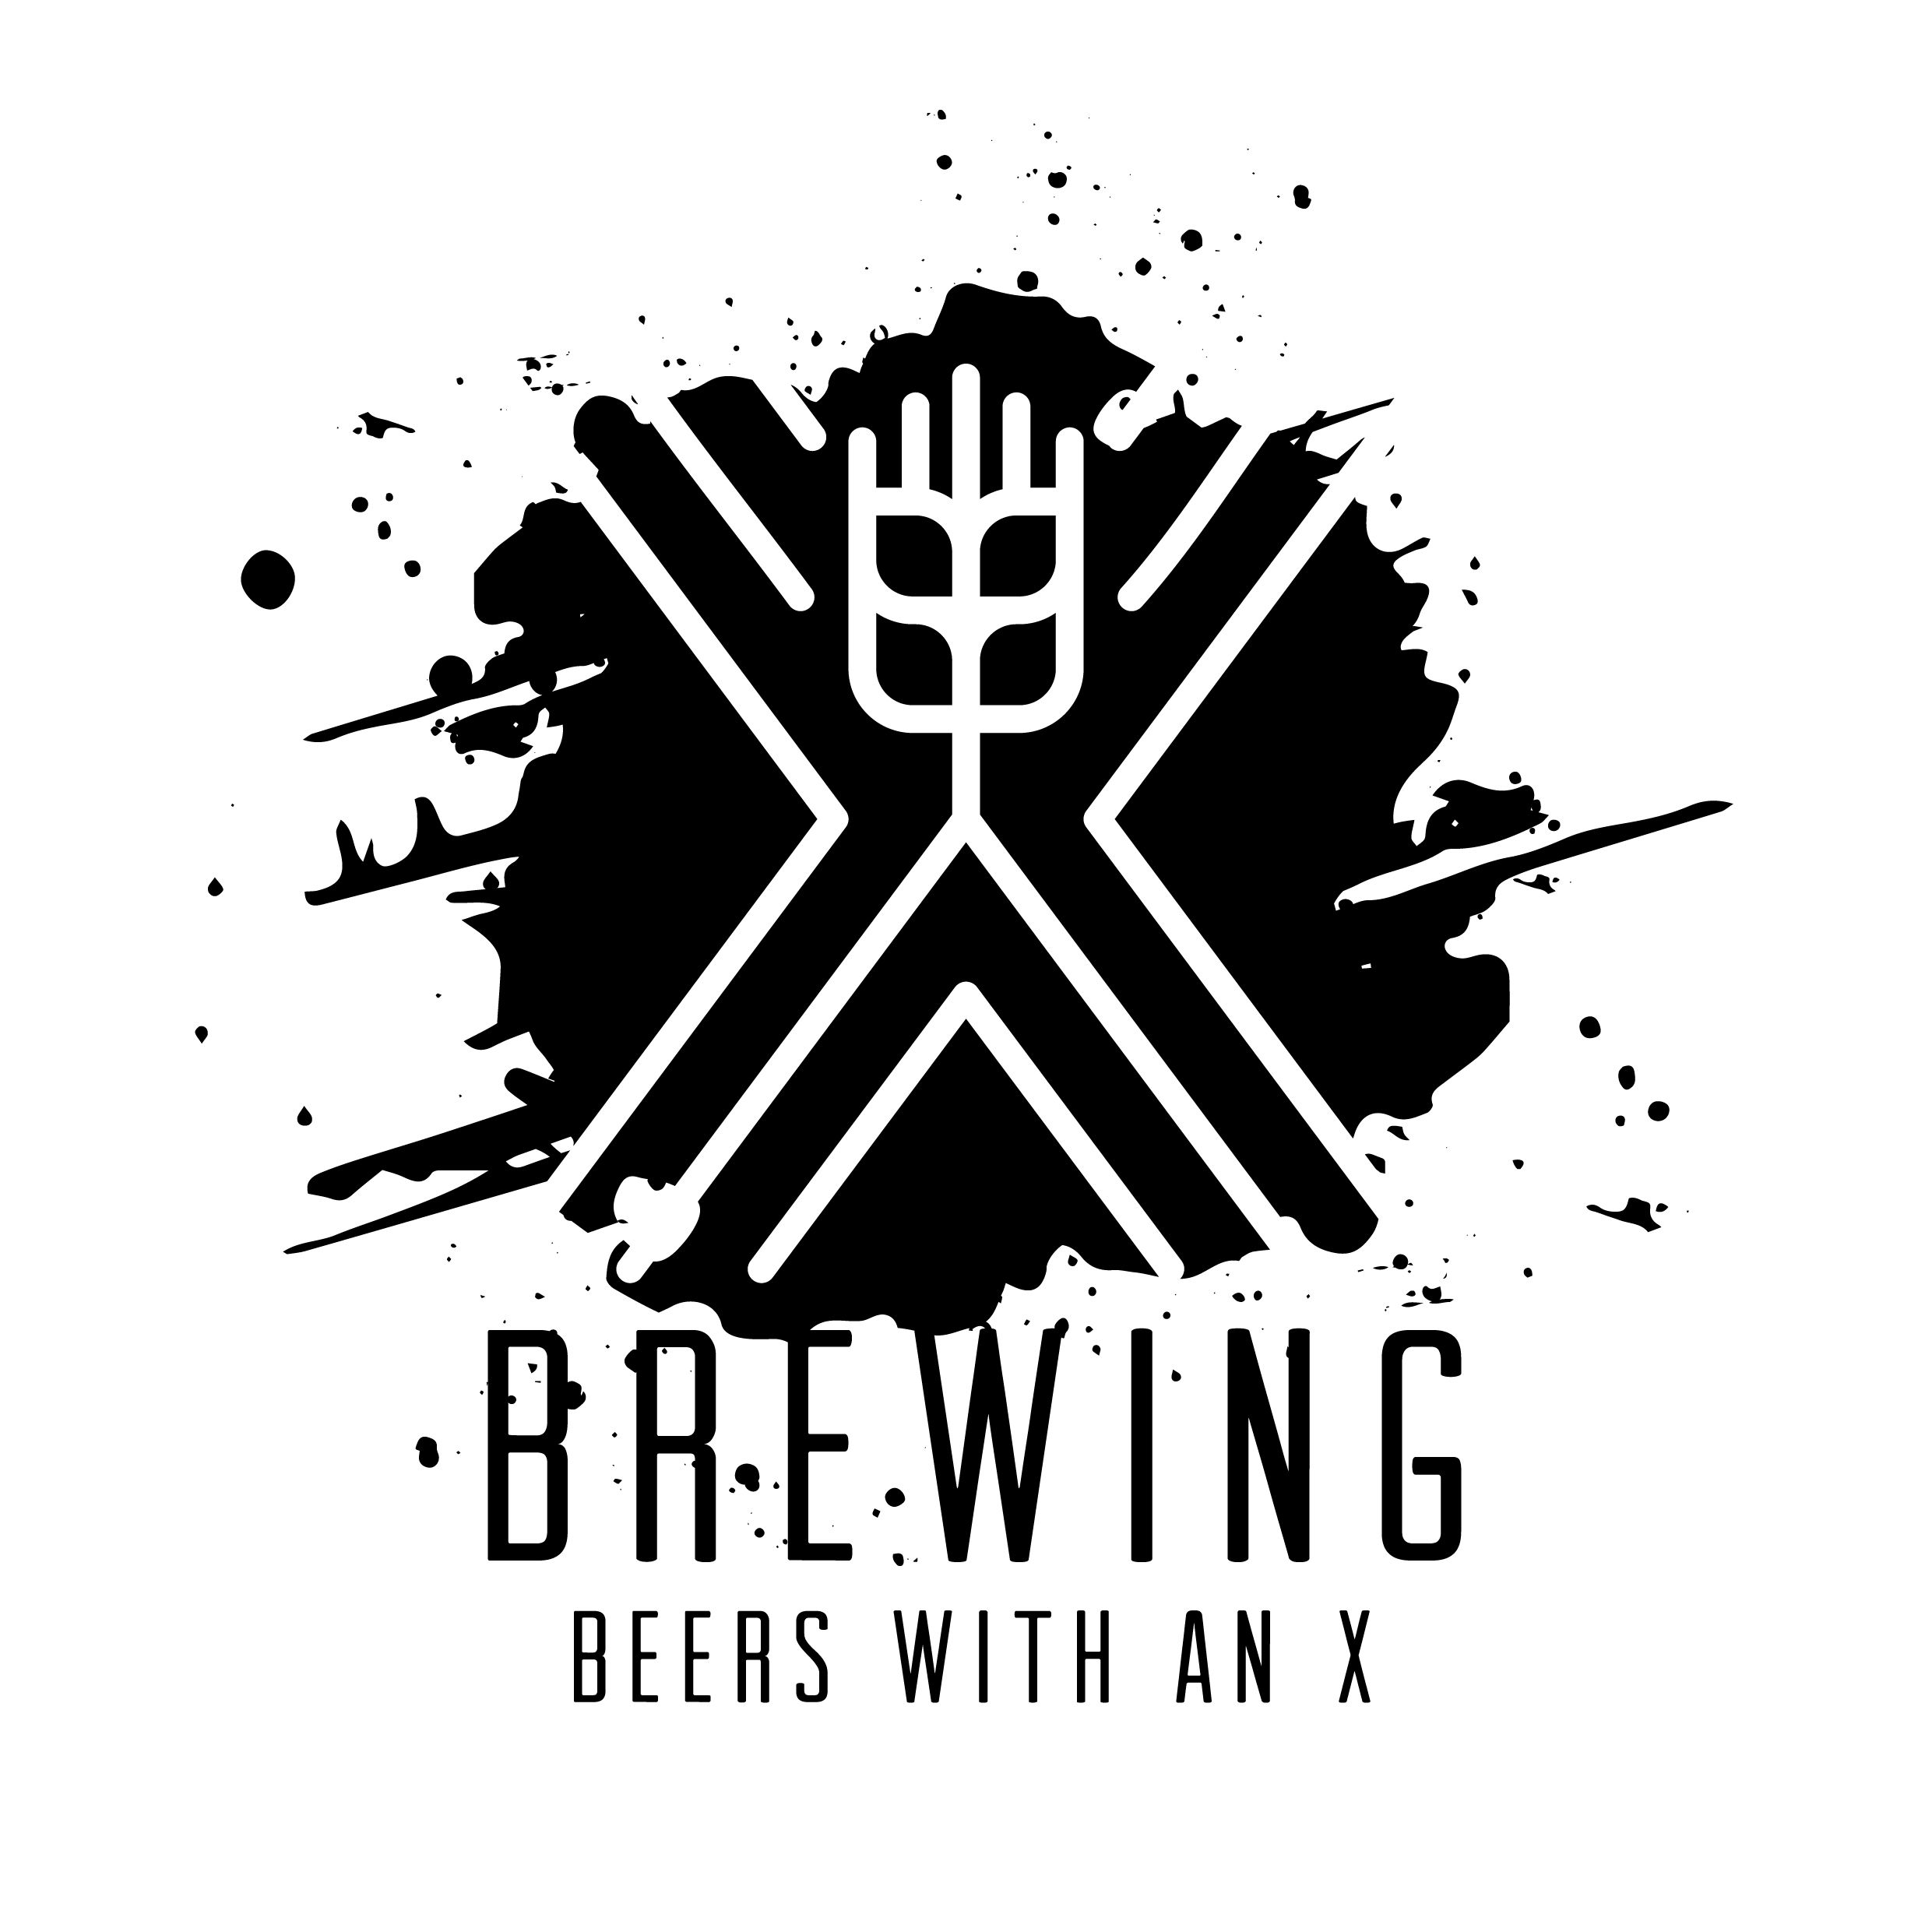 X-brewing logo